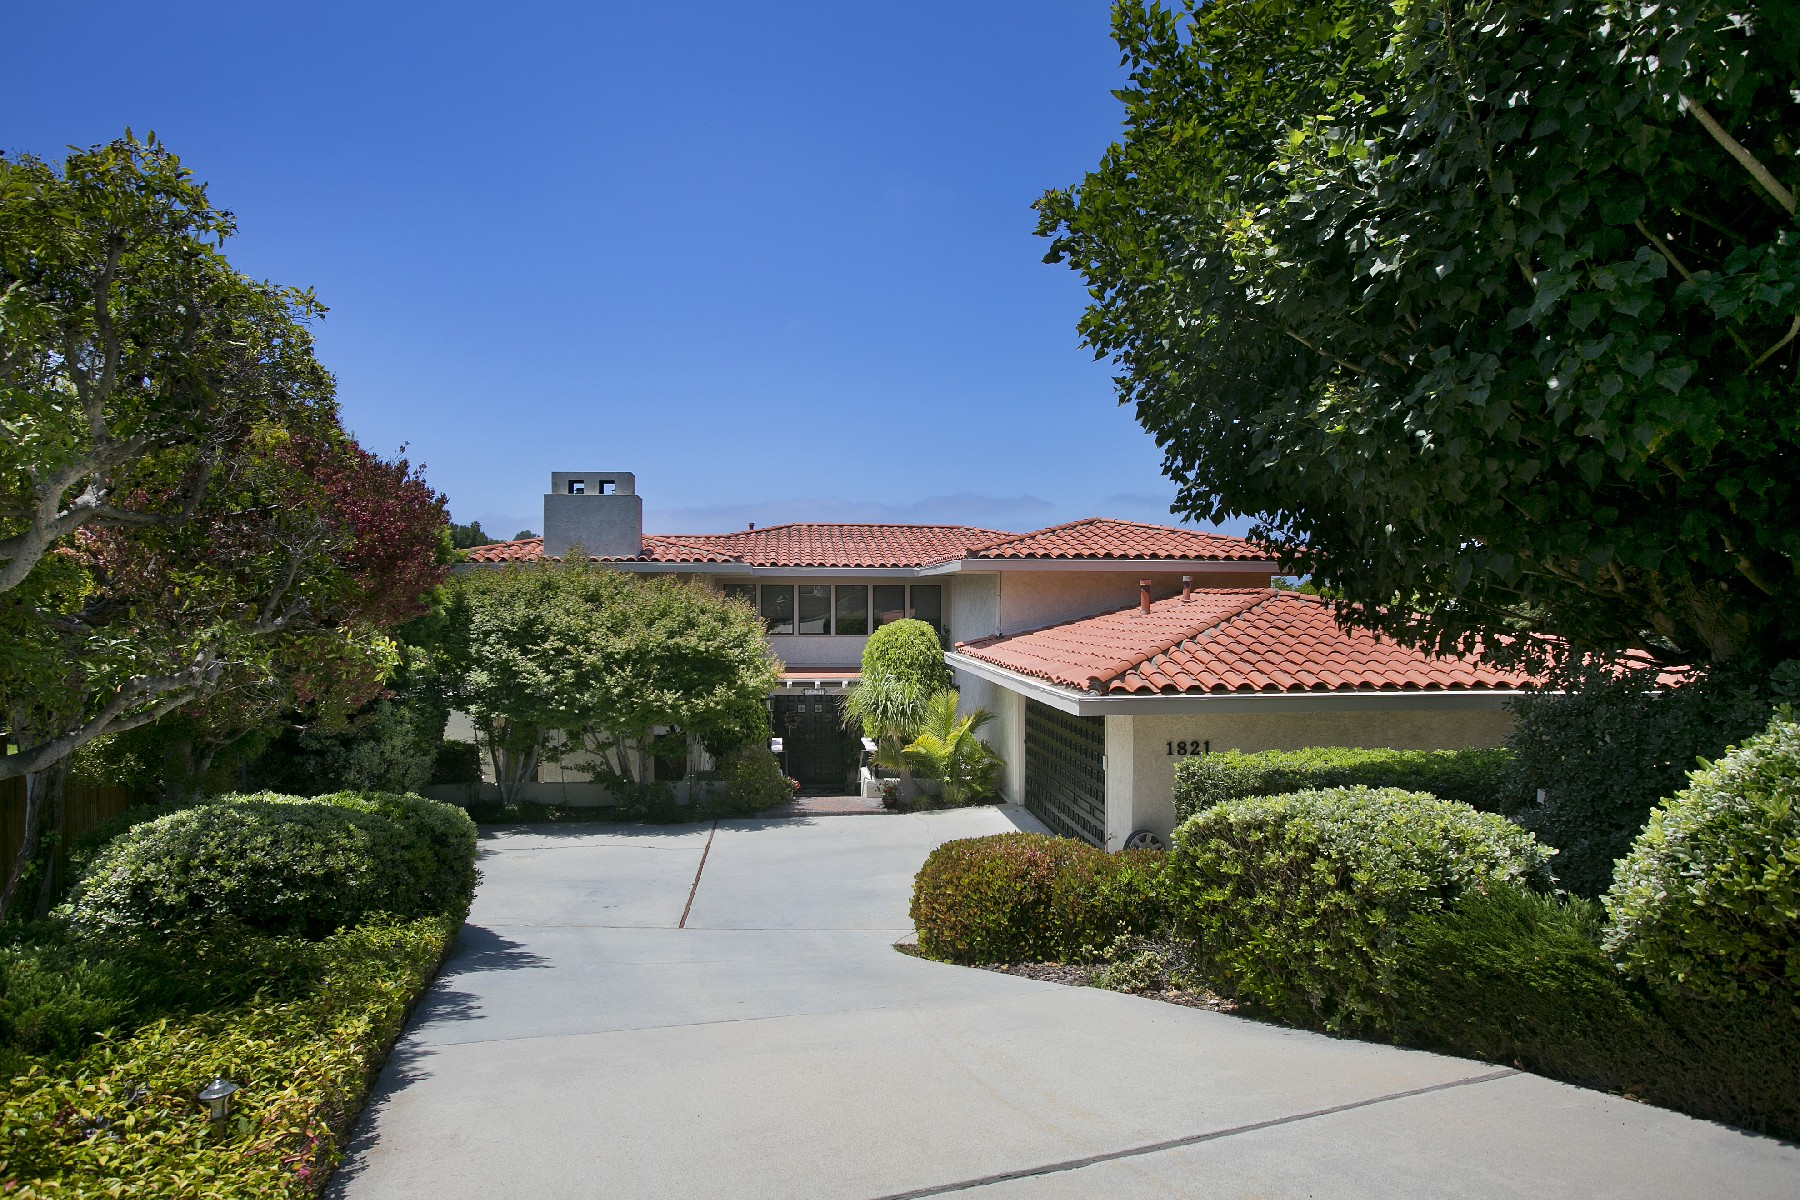 Moradia para Venda às 1821 Via Estudillo, Palos Verdes Estates 90274 Palos Verdes Estates, Califórnia, 90274 Estados Unidos